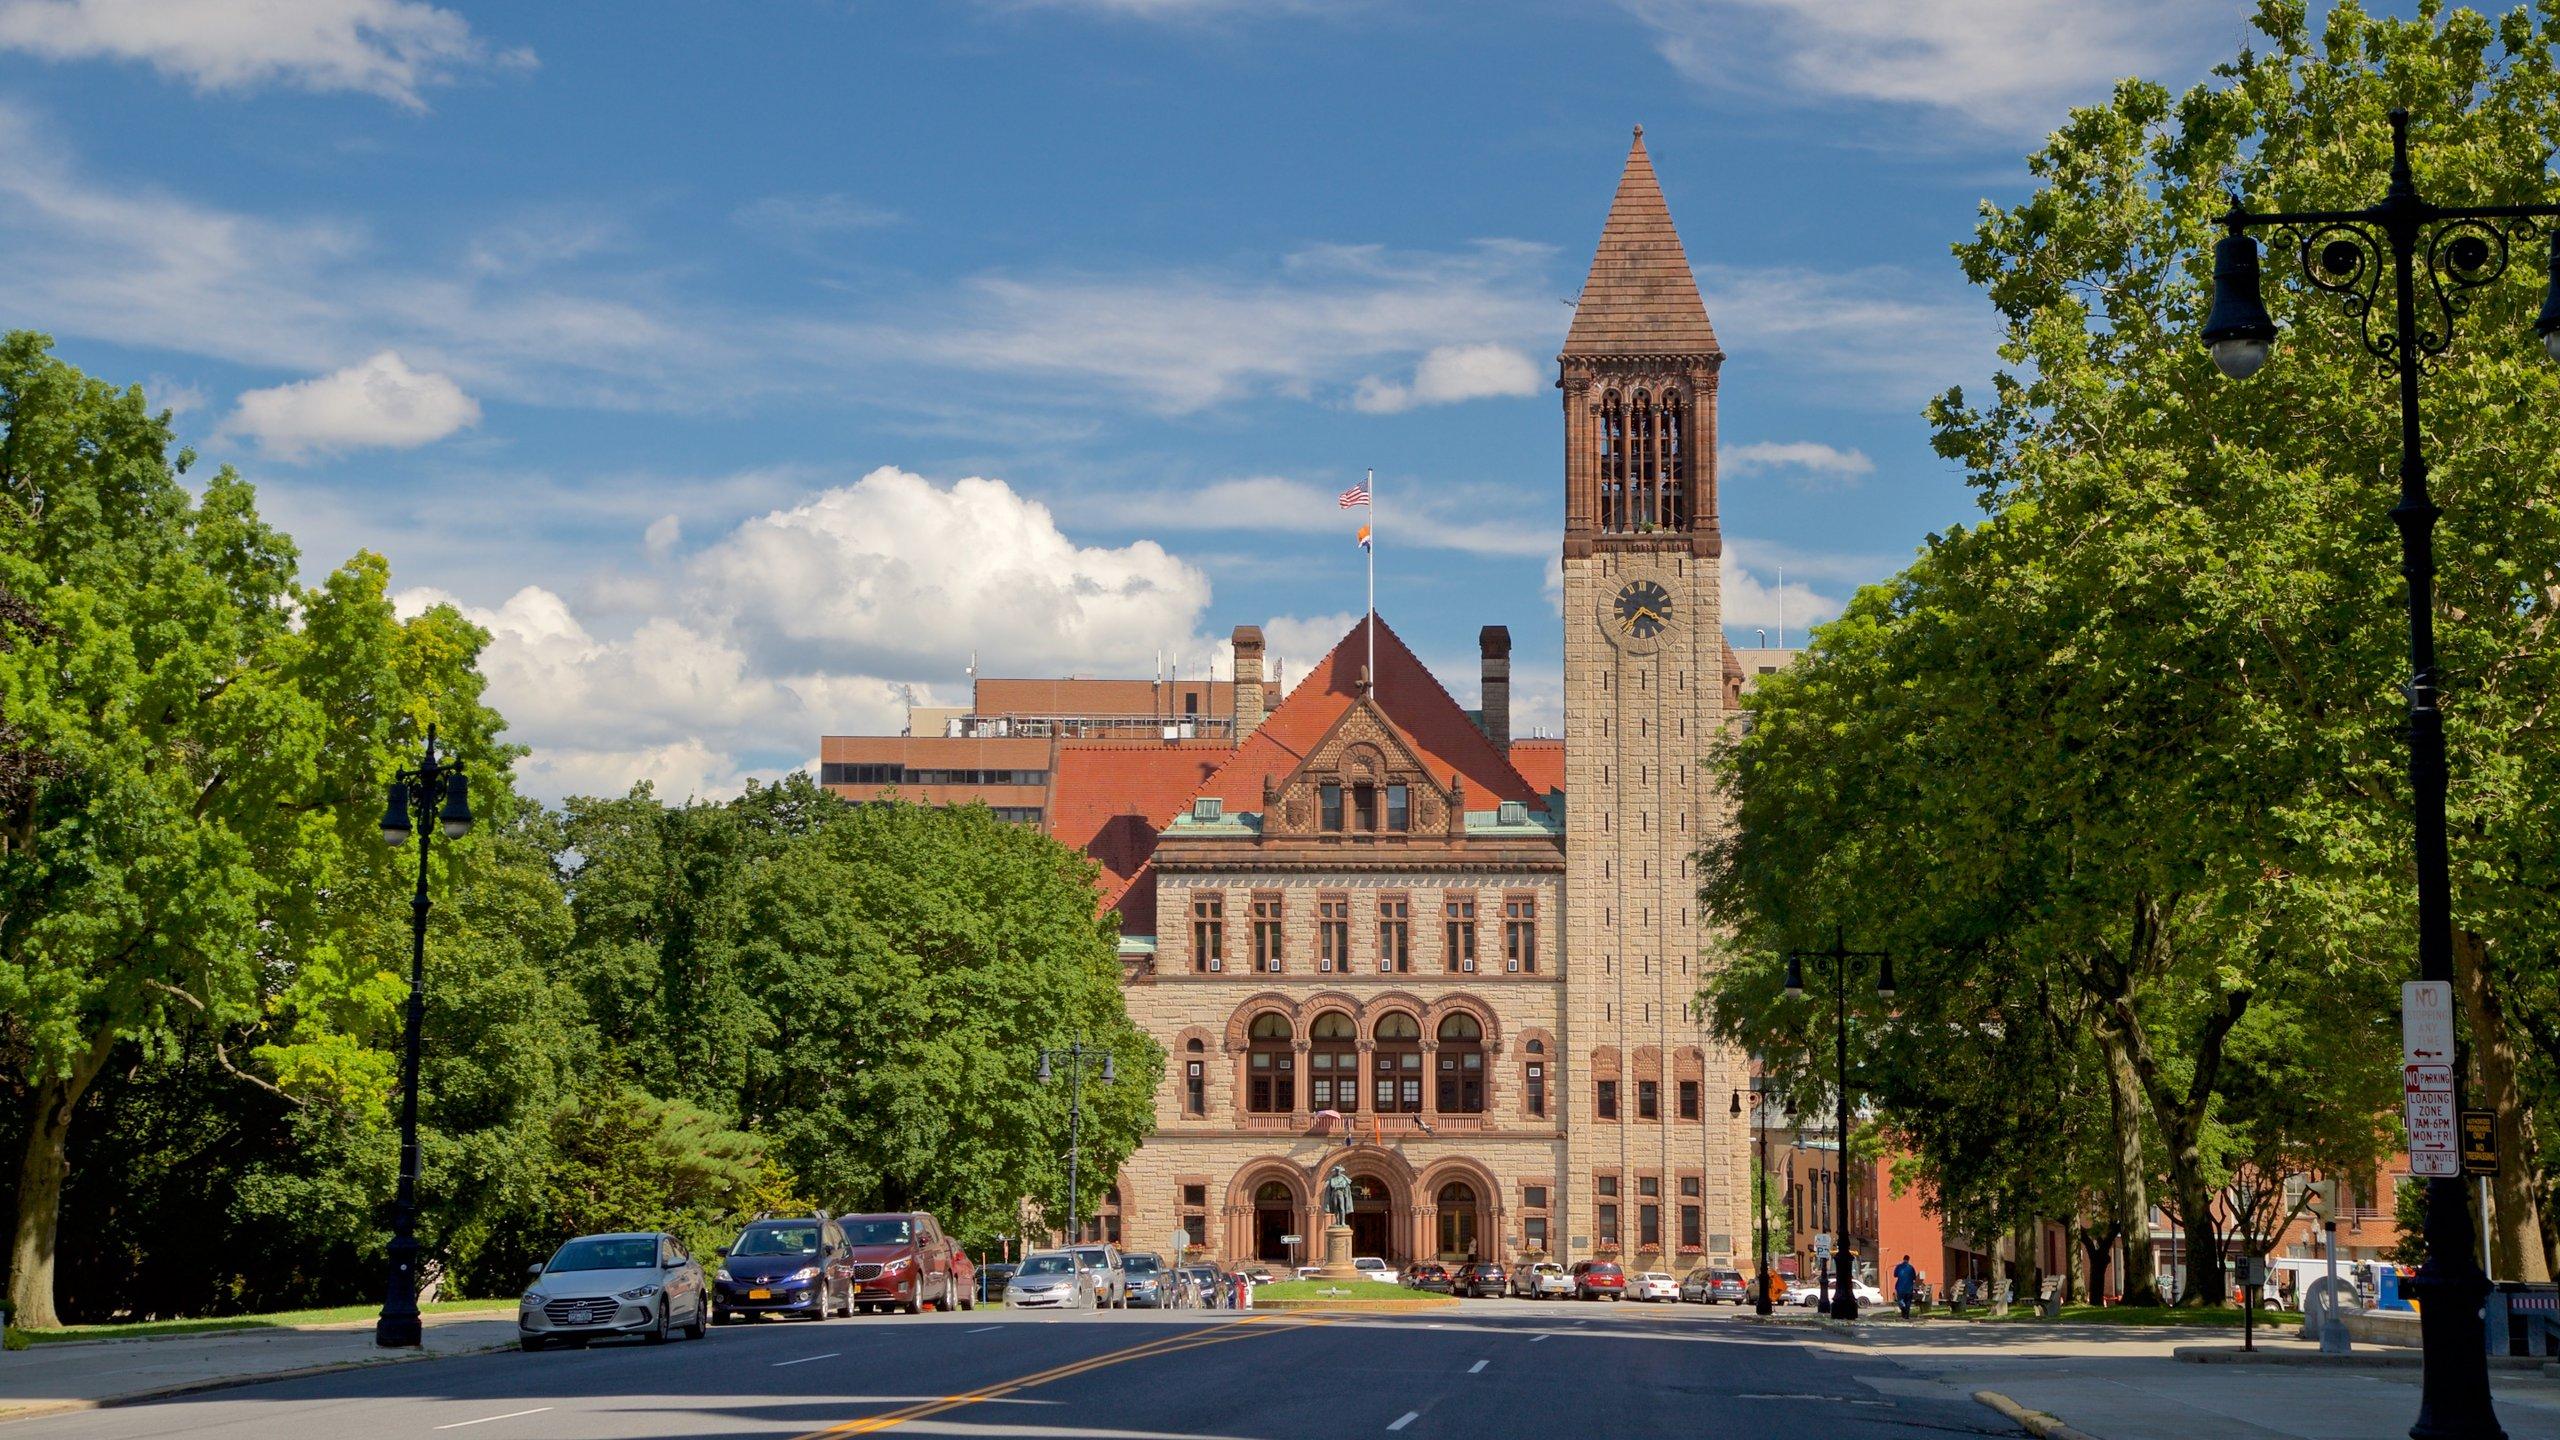 Albany City Hall, Albany, New York, United States of America